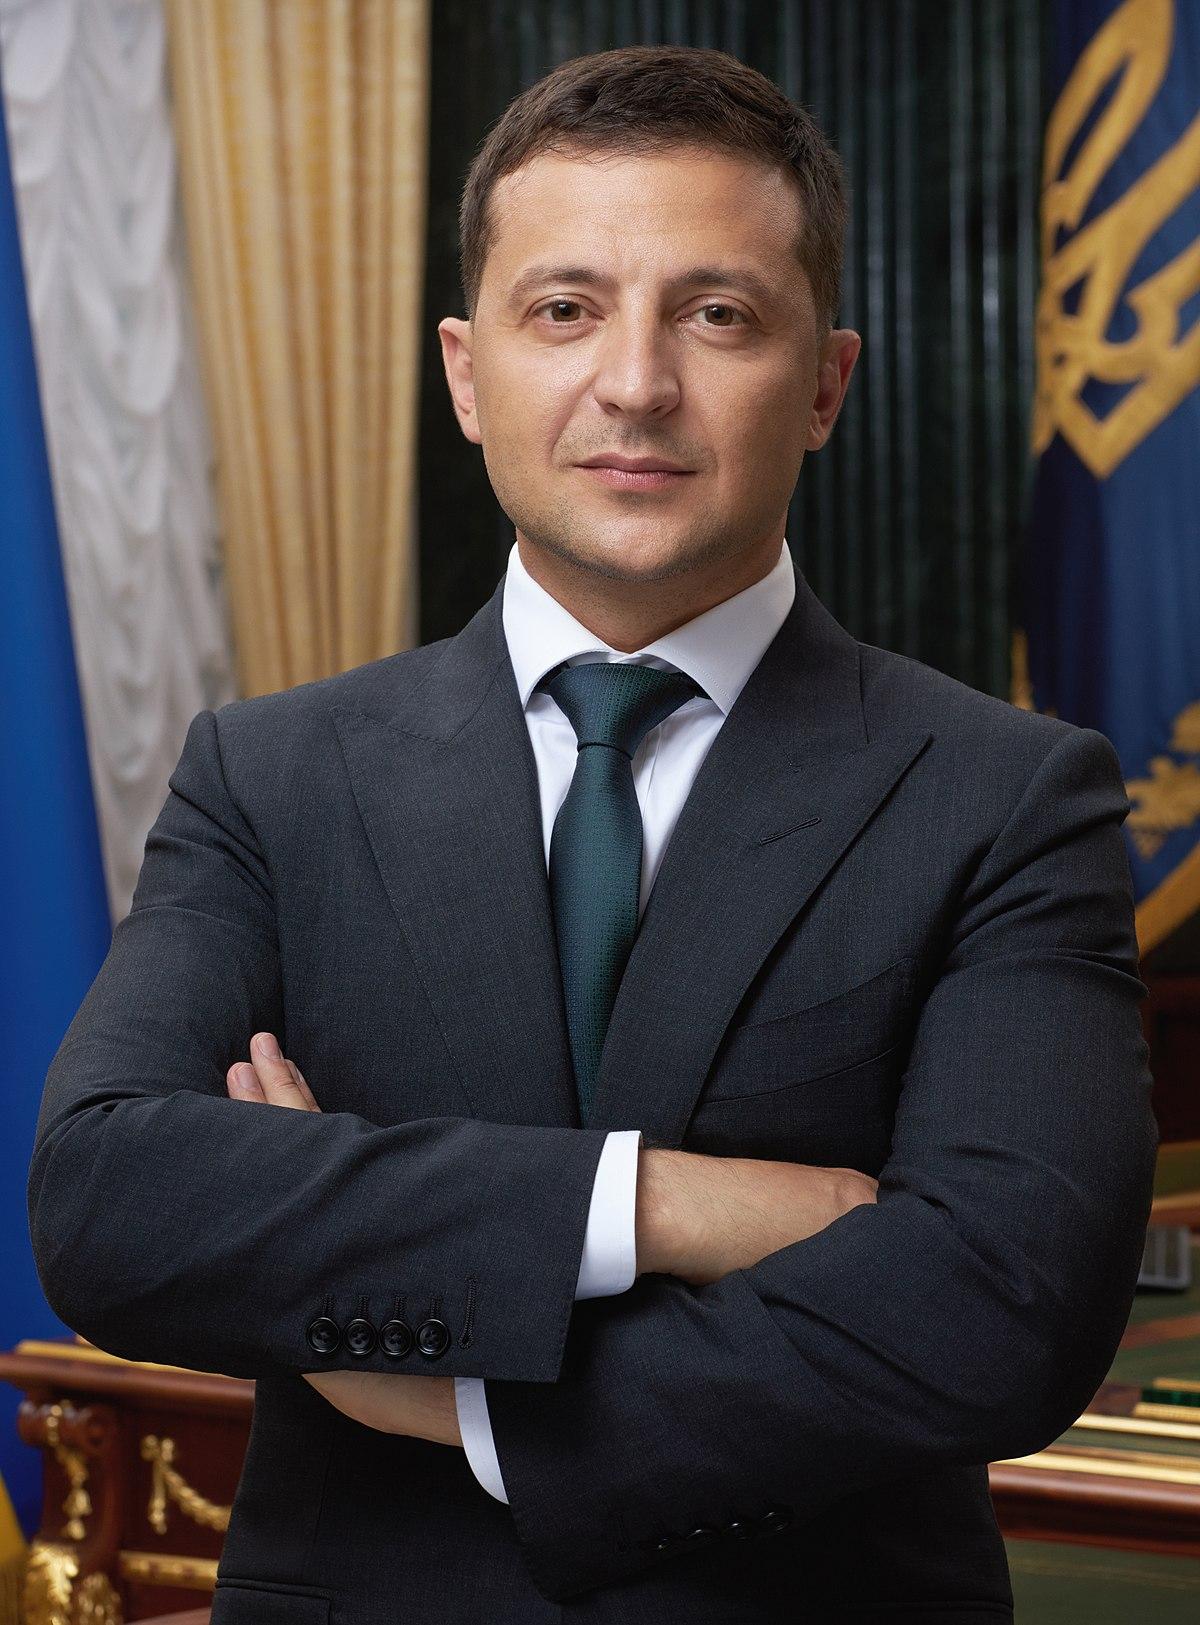 Volodymyr Zelensky Wikipedia